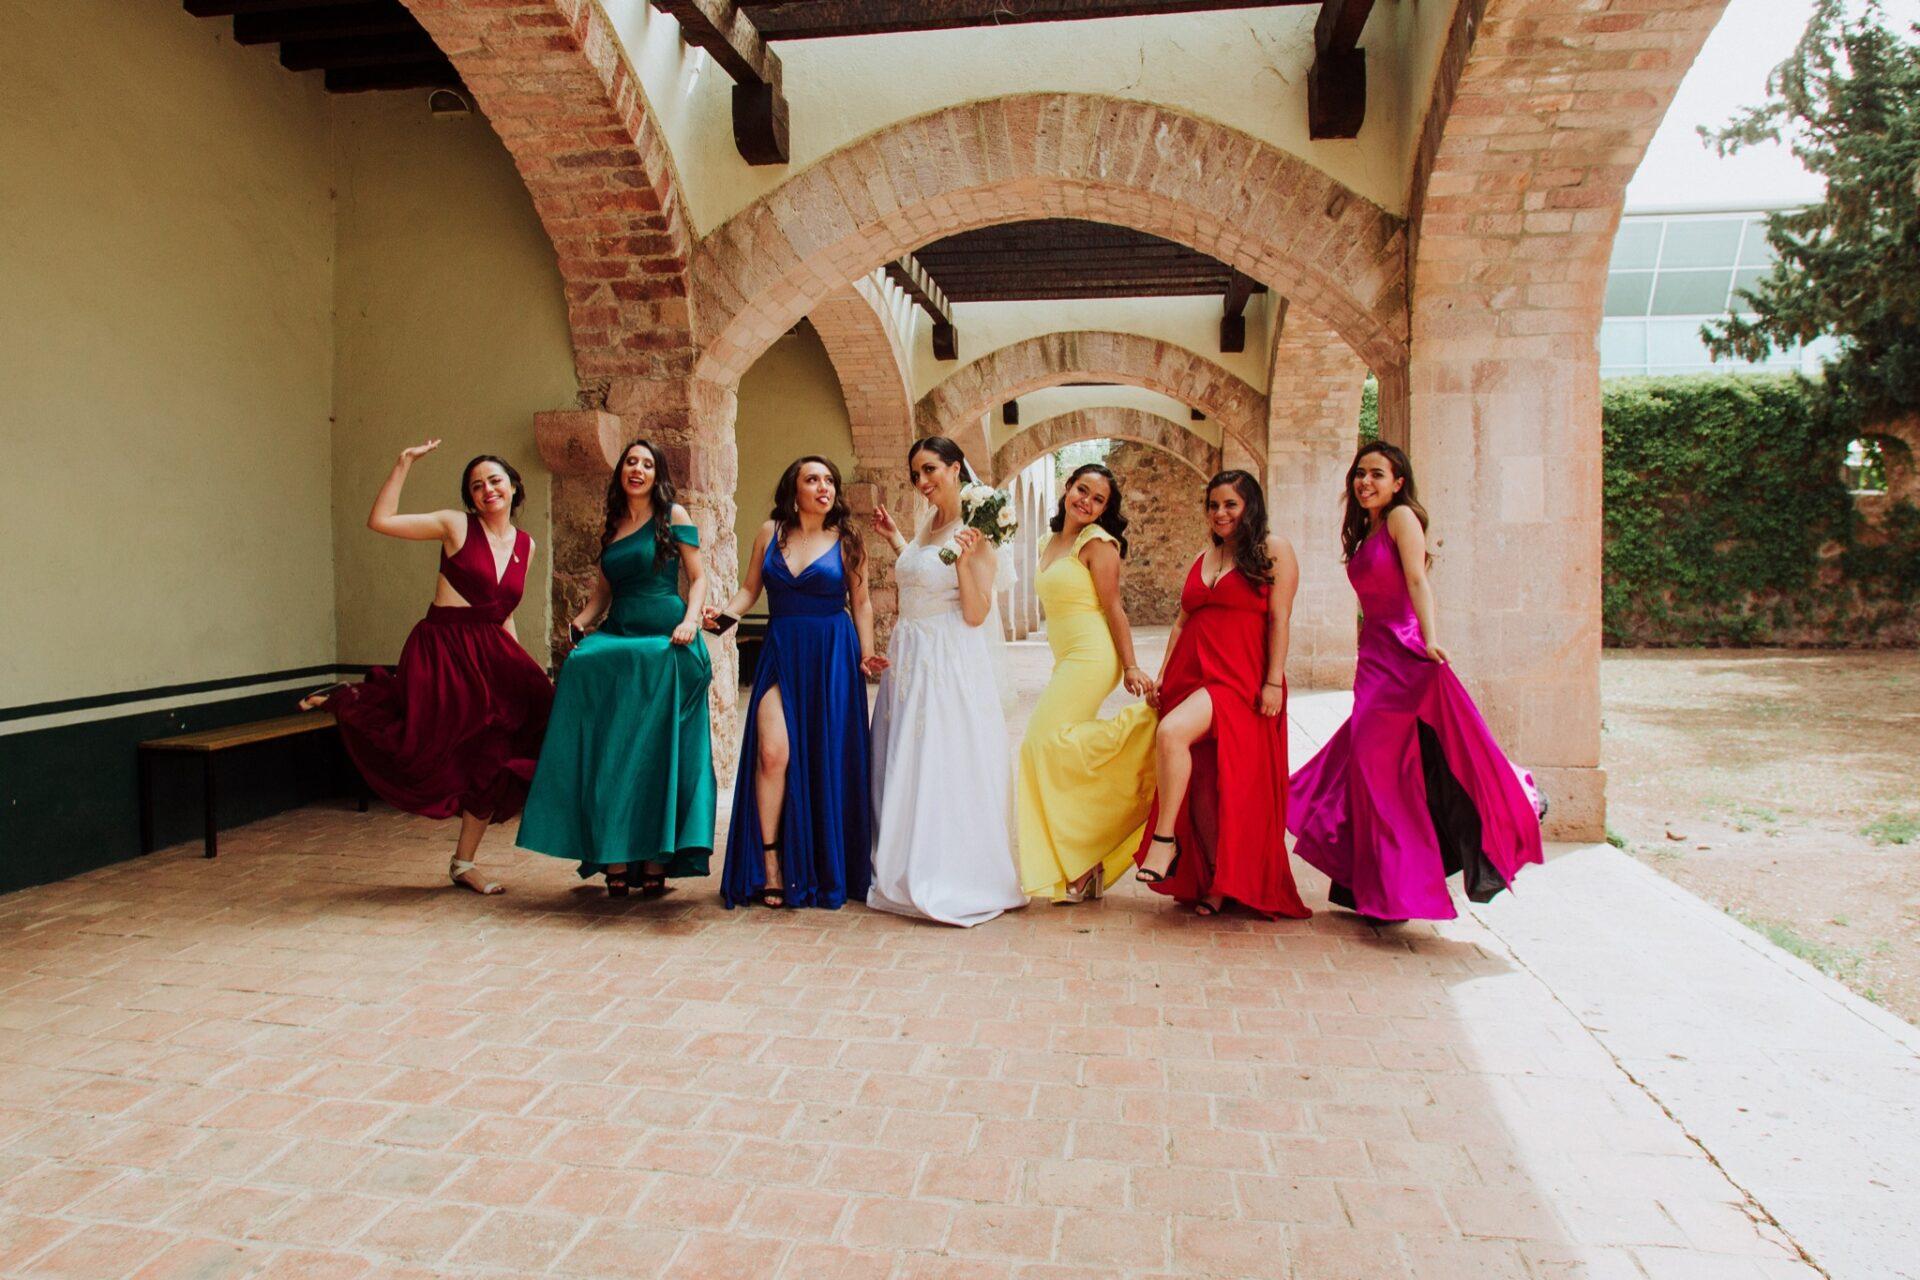 javier_noriega_fotografo_bodas_centro_platero_zacatecas_wedding_photographer28